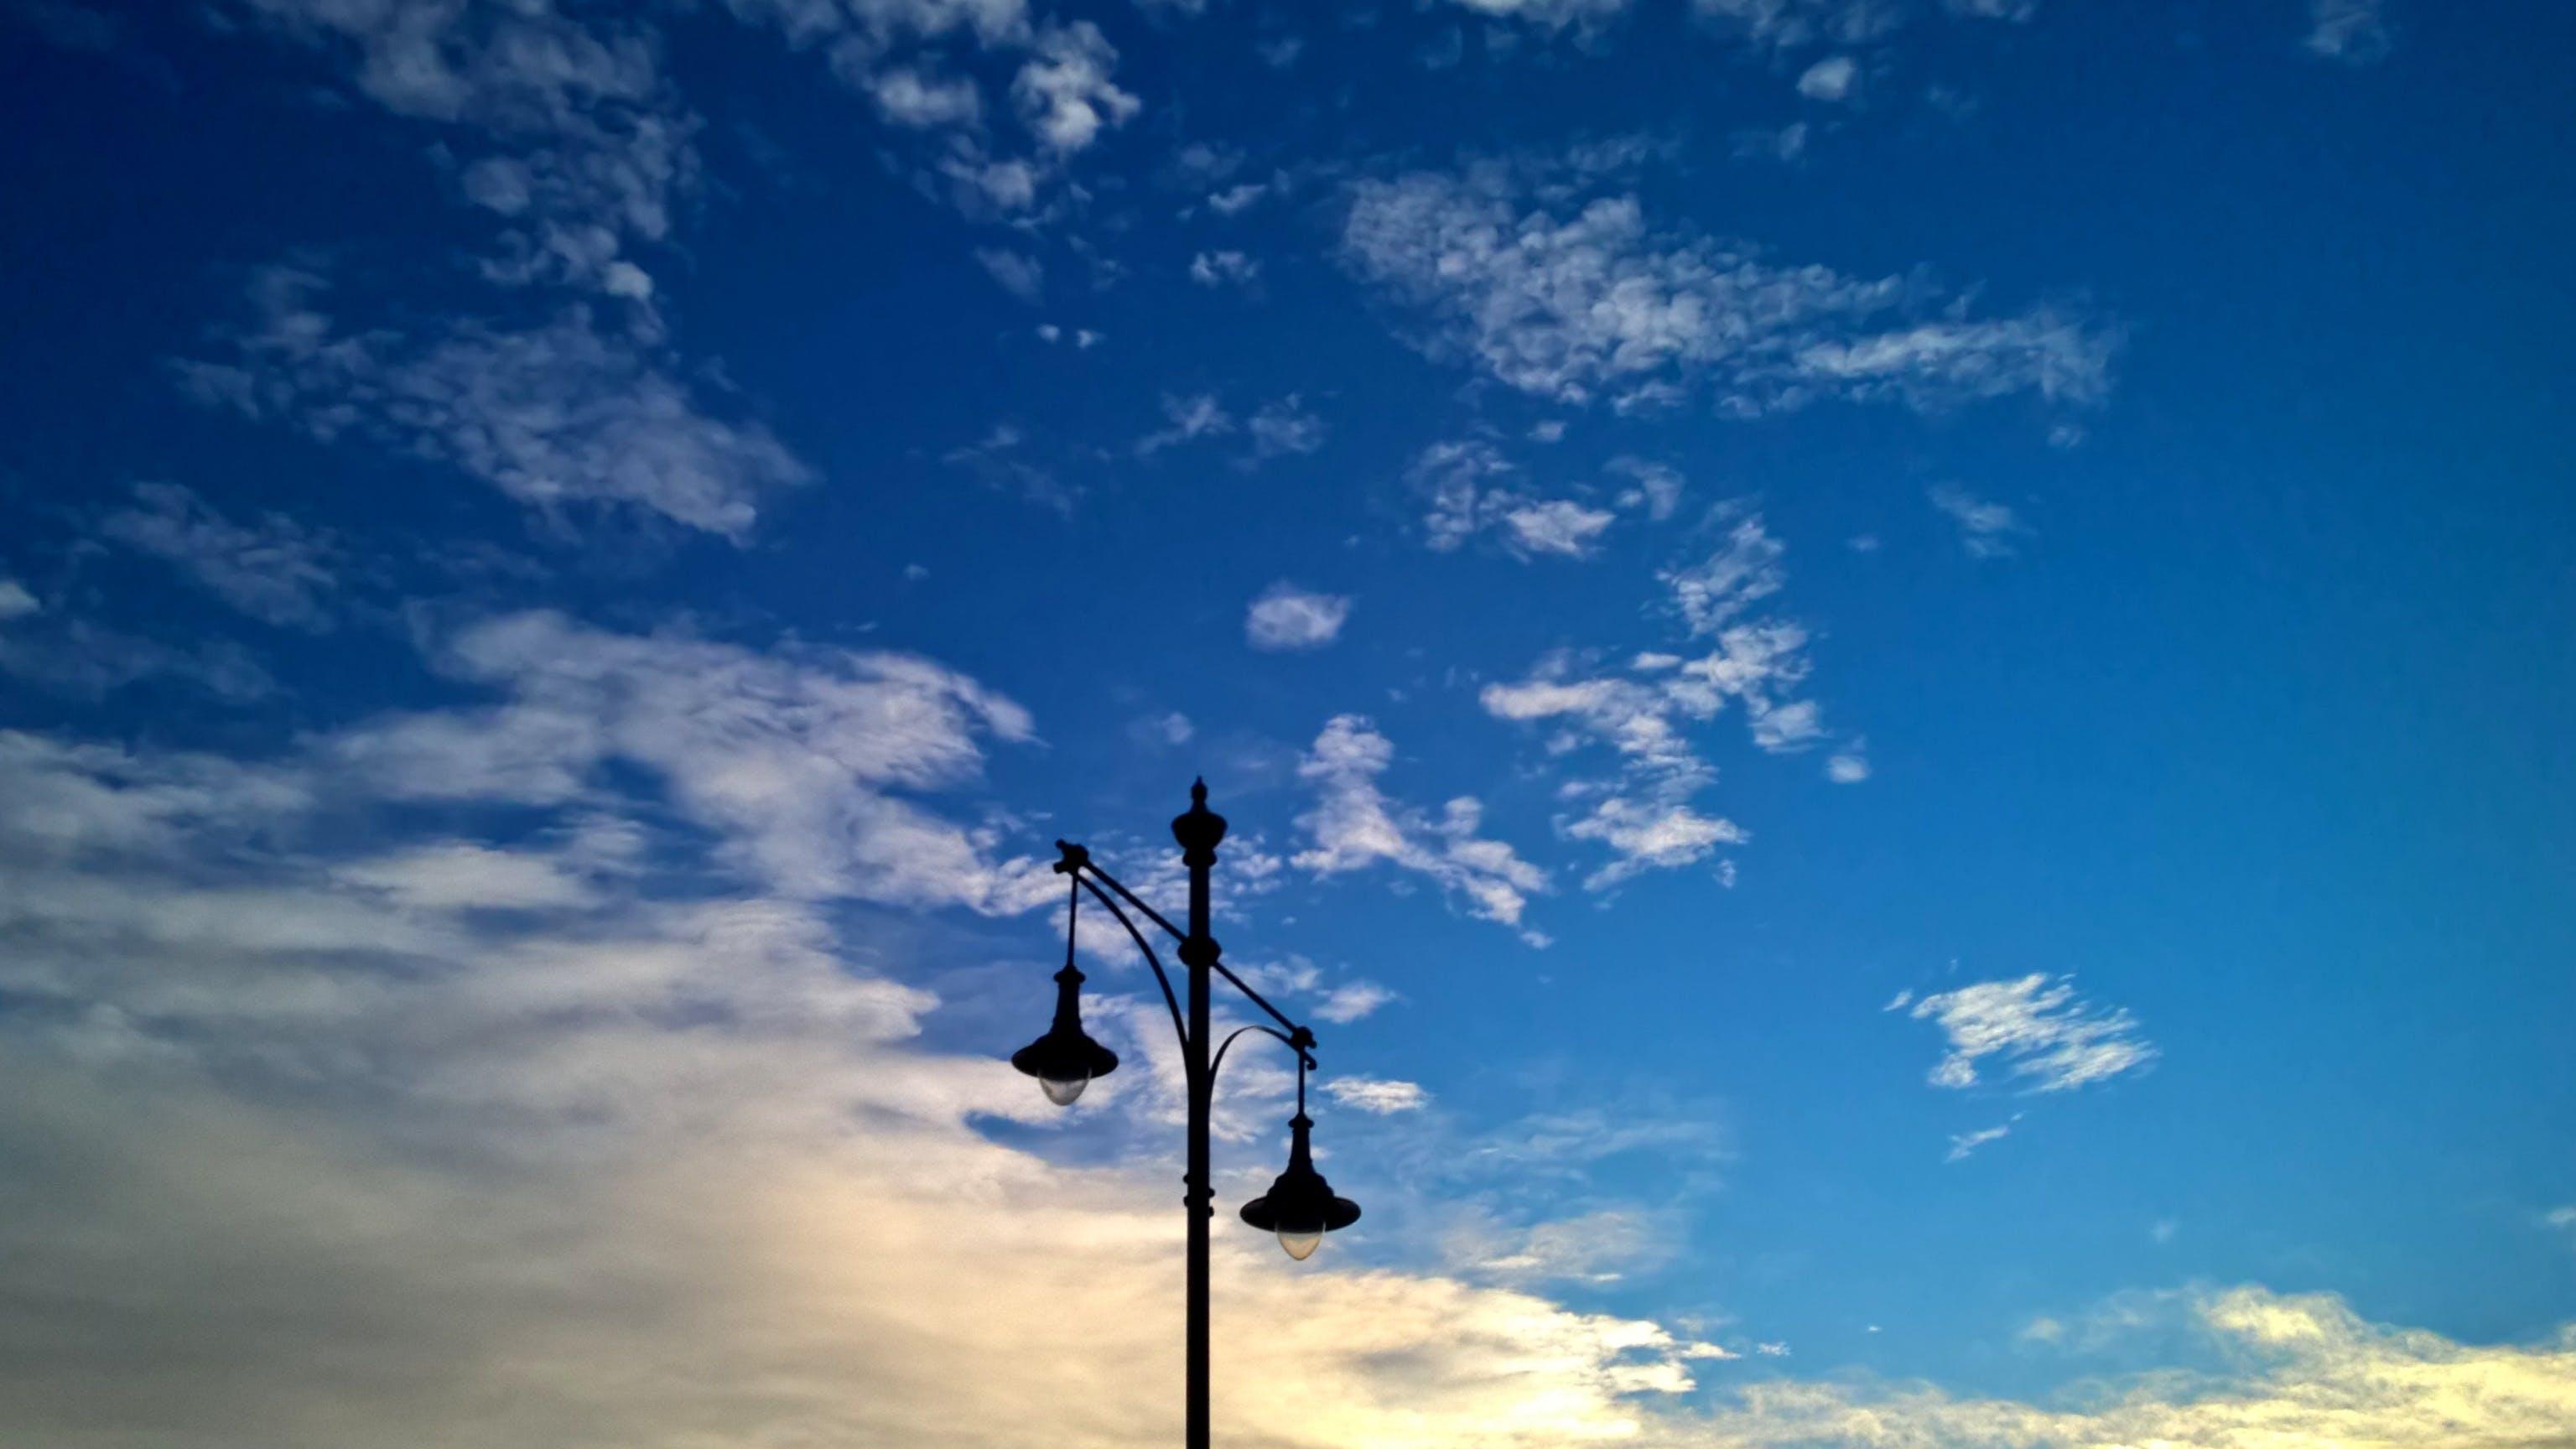 Free stock photo of sky, urban, hungary, Budapest